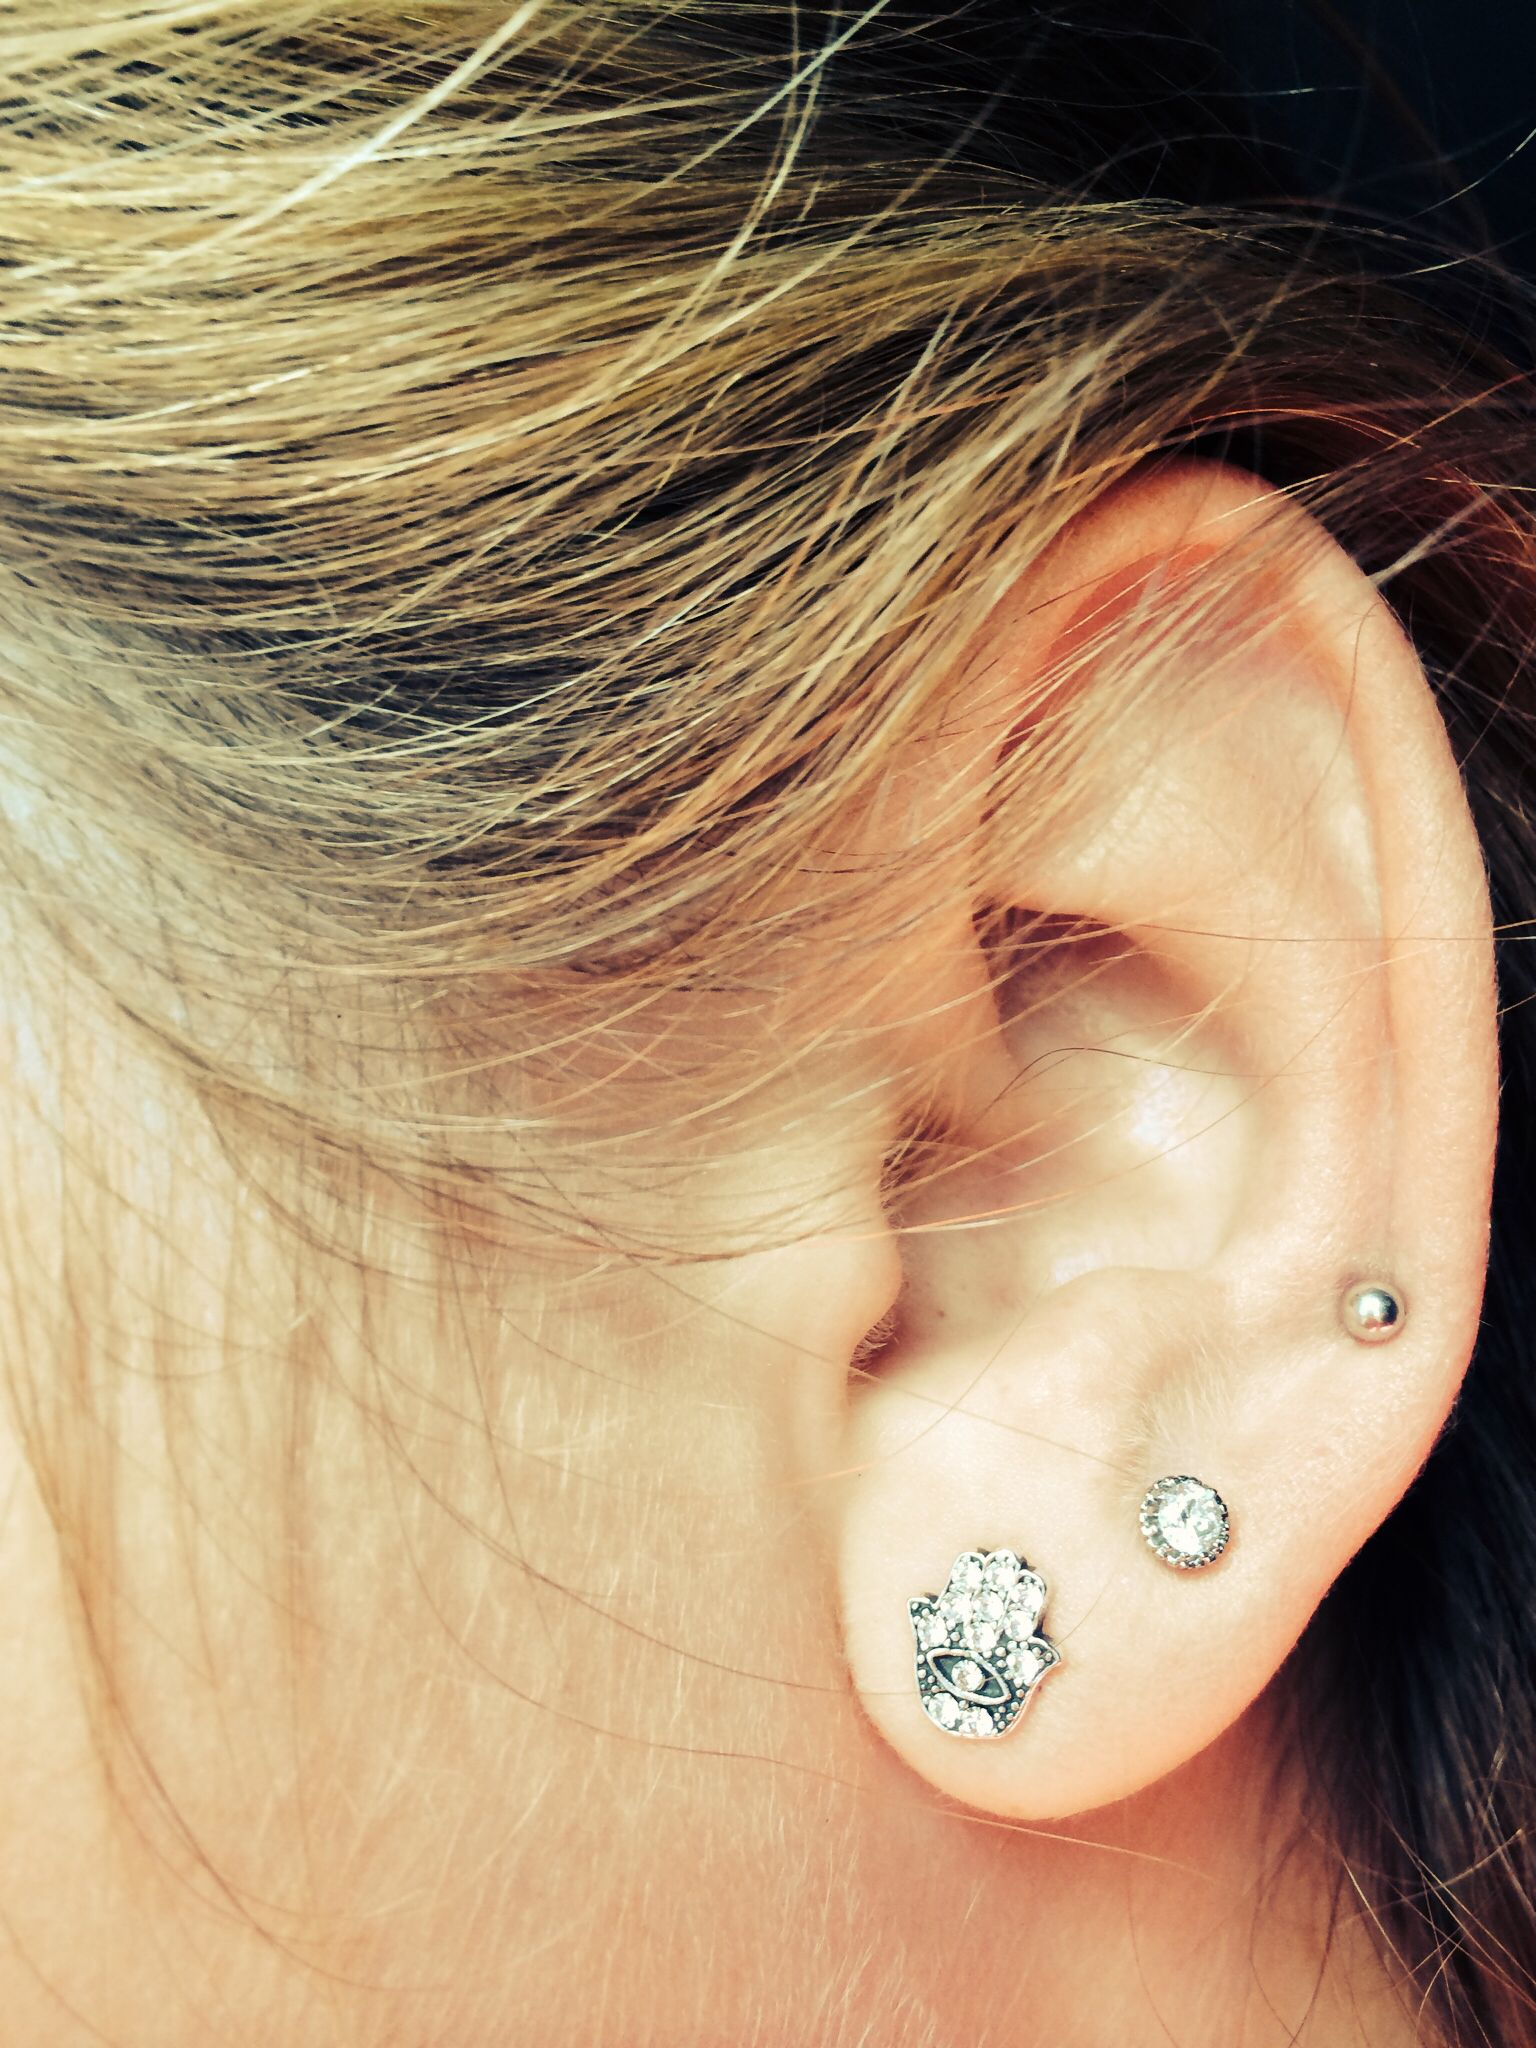 Ear lobe piercing names  midway  tat me up and pierce me  Pinterest  Piercing Piercing